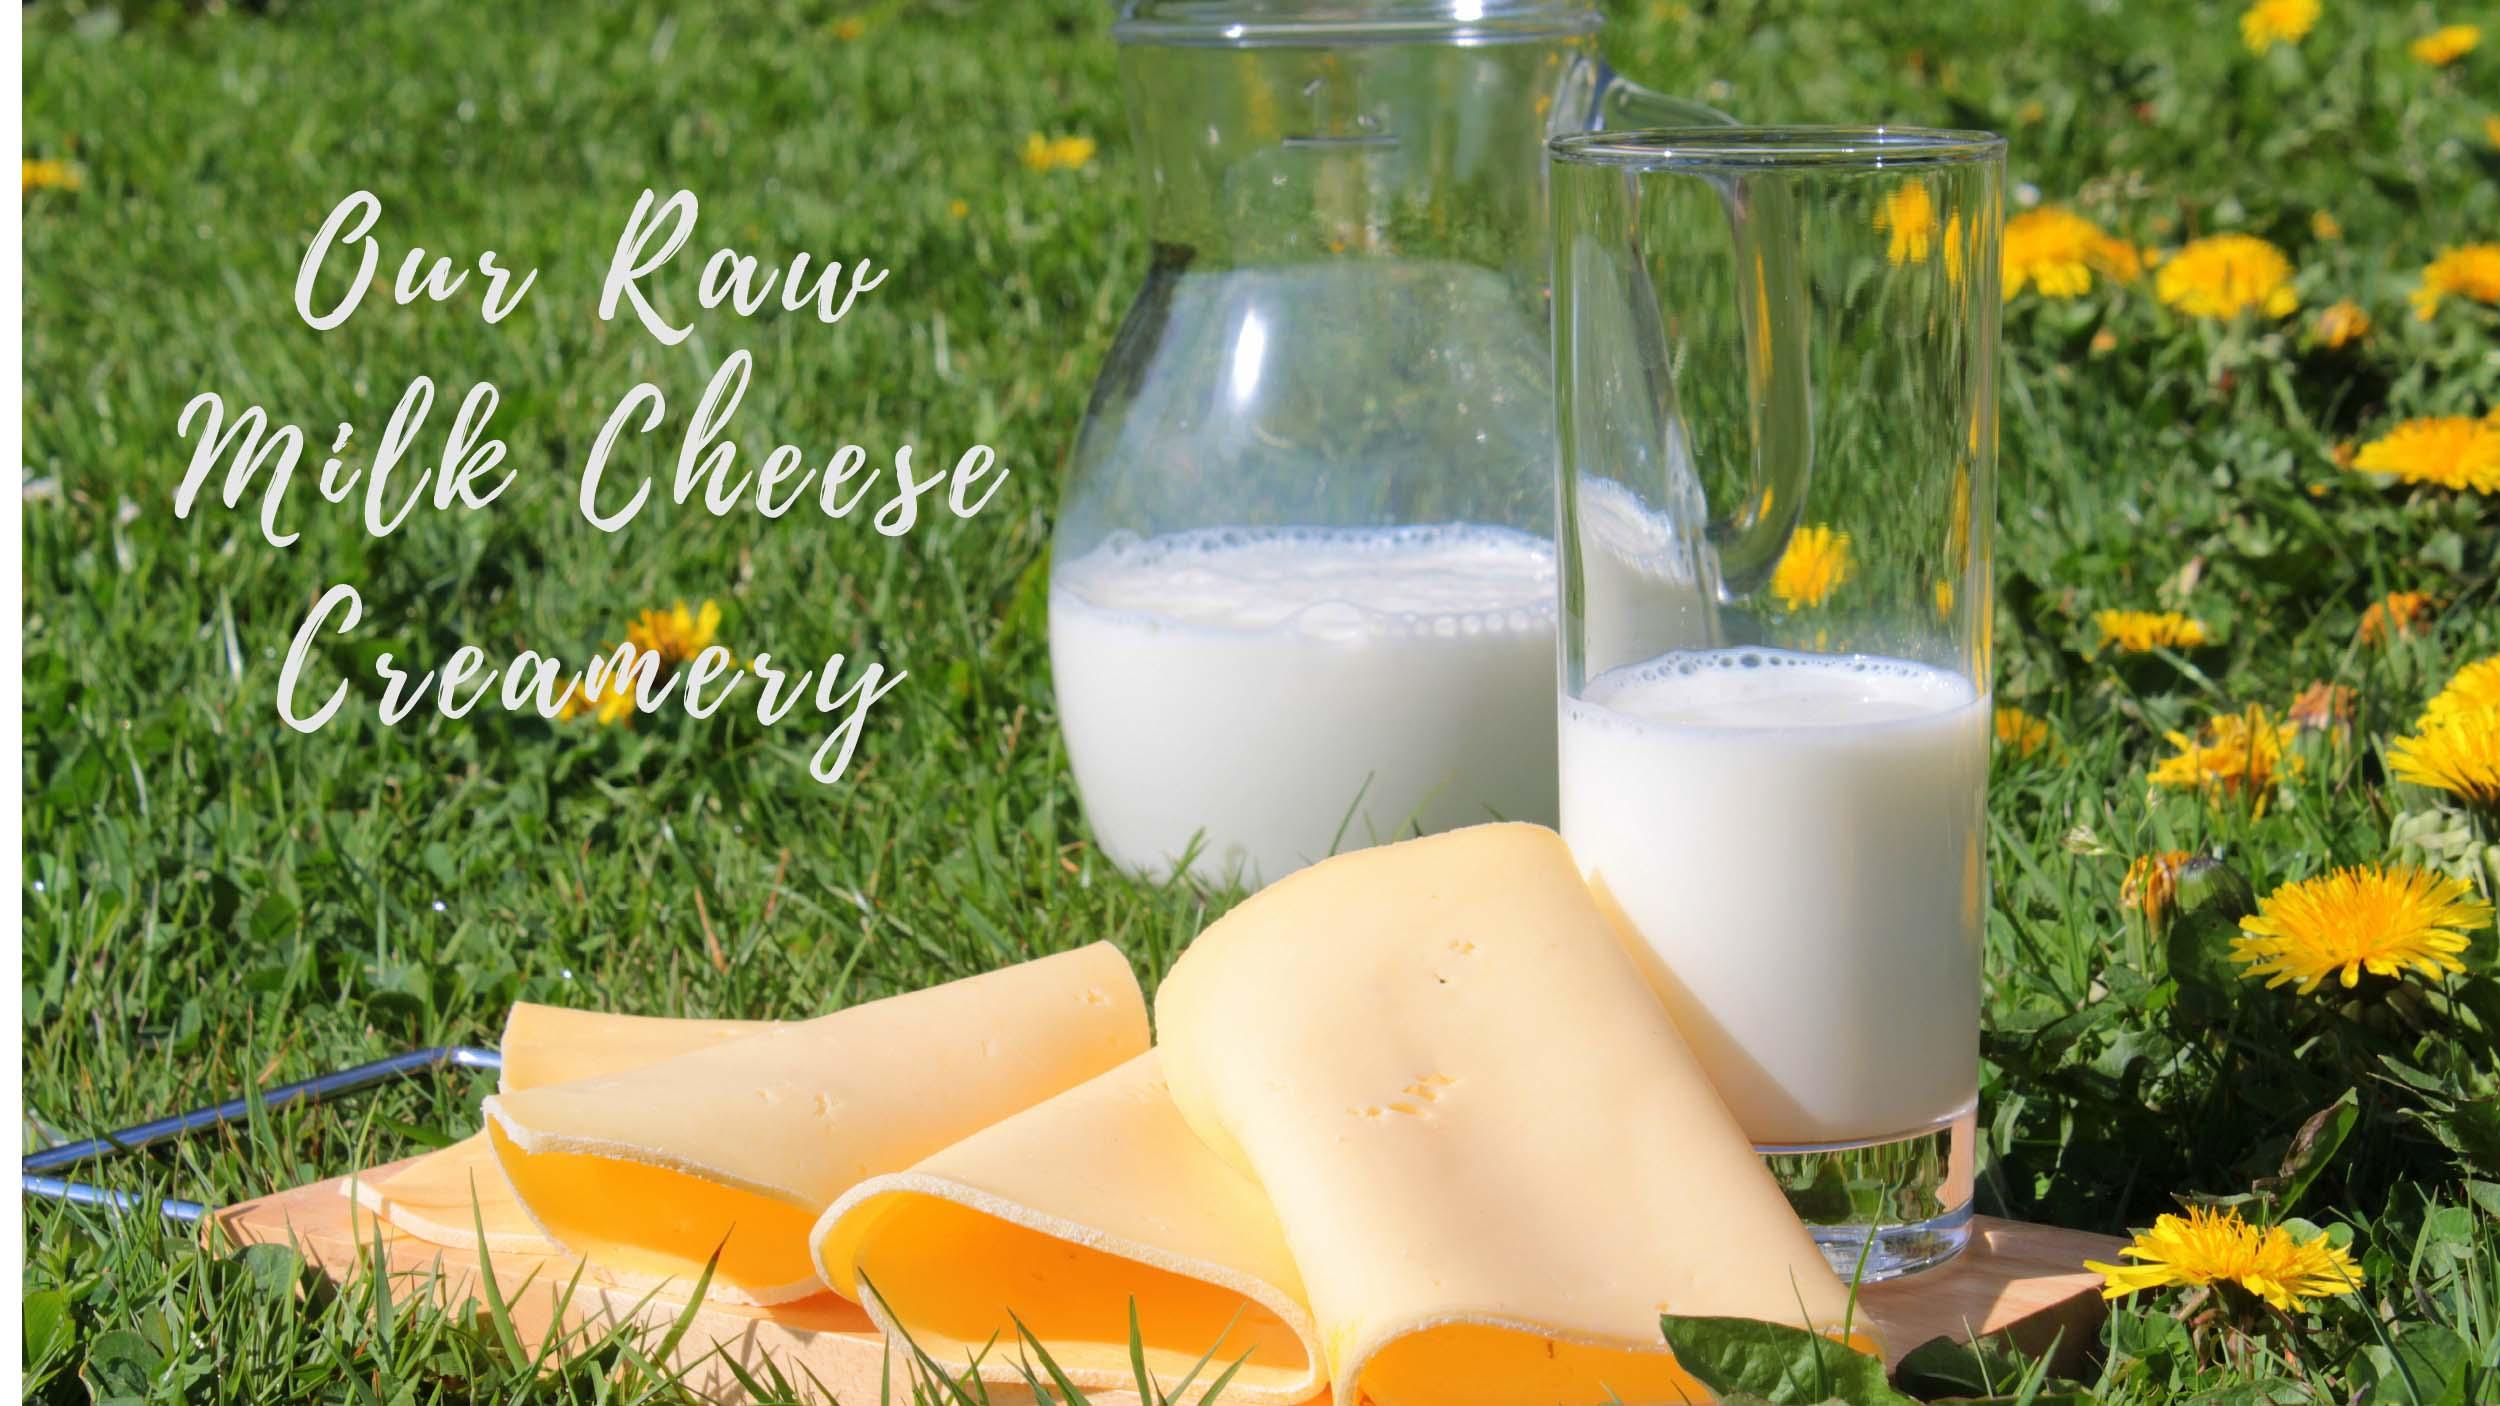 Our Raw Milk Cheese Creamery Progress